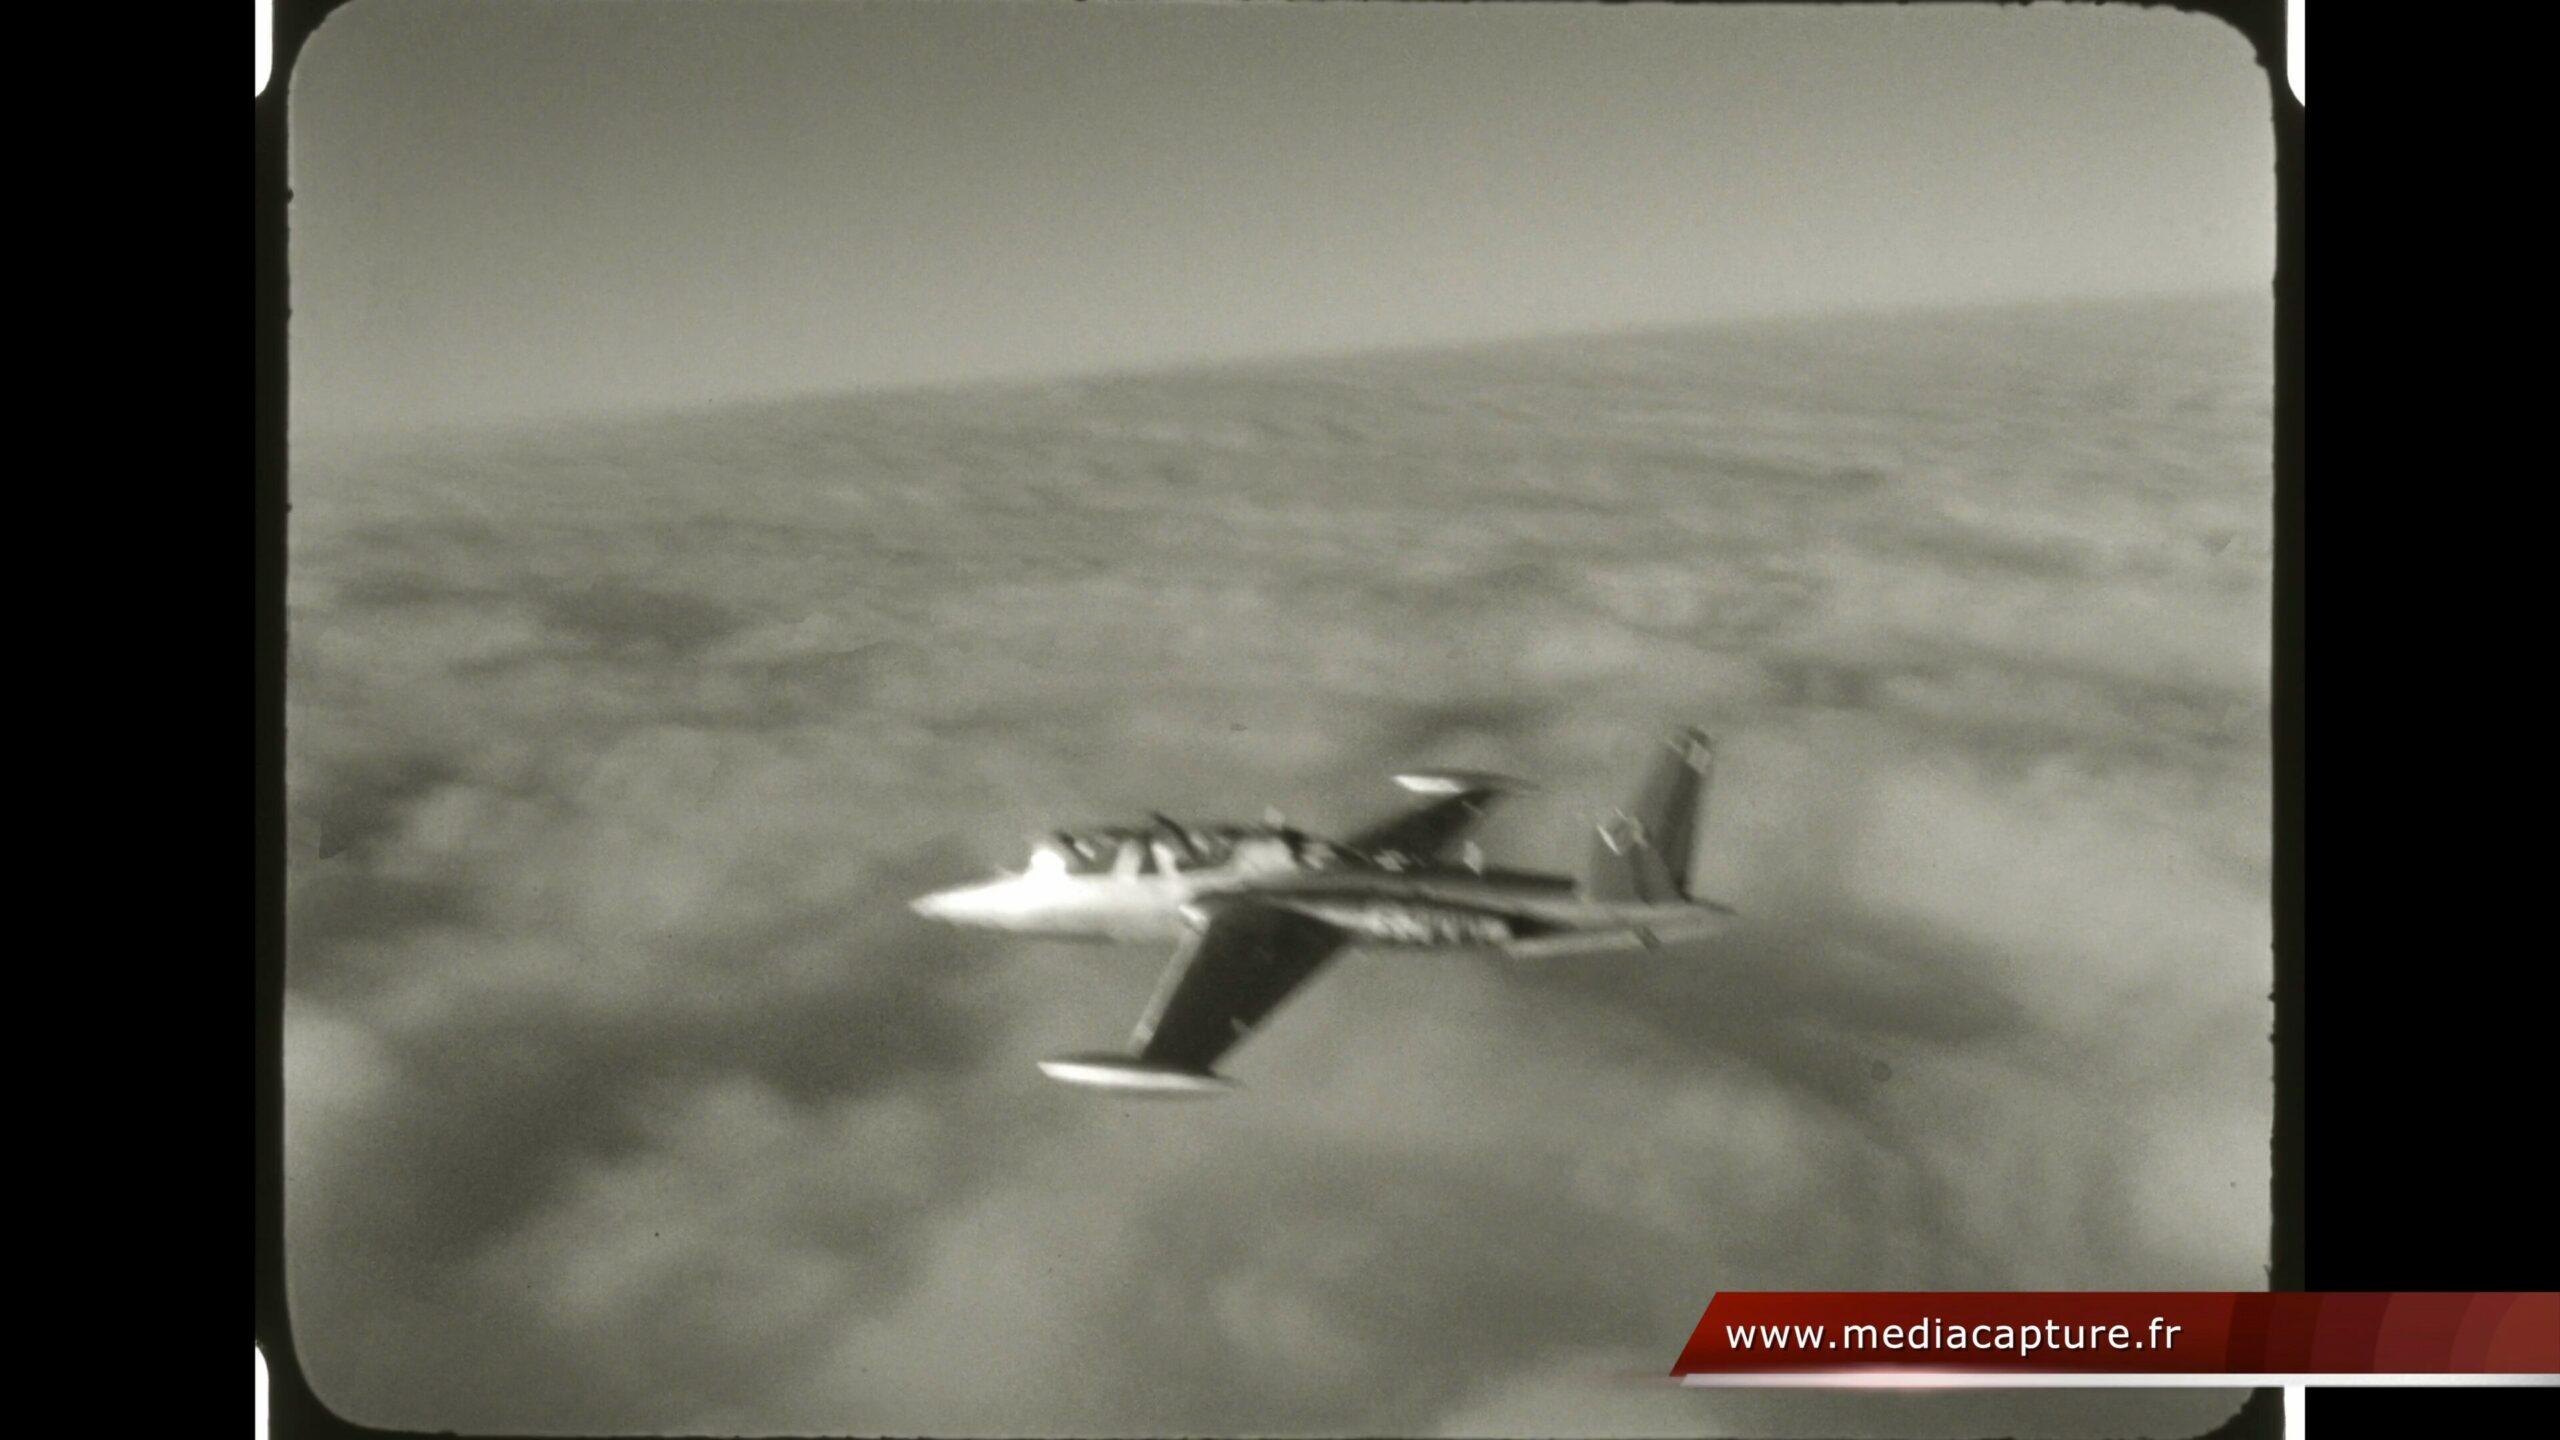 A bord du CM173 SUPER MAGISTER - 1965 - 720p www.mediacapture.fr